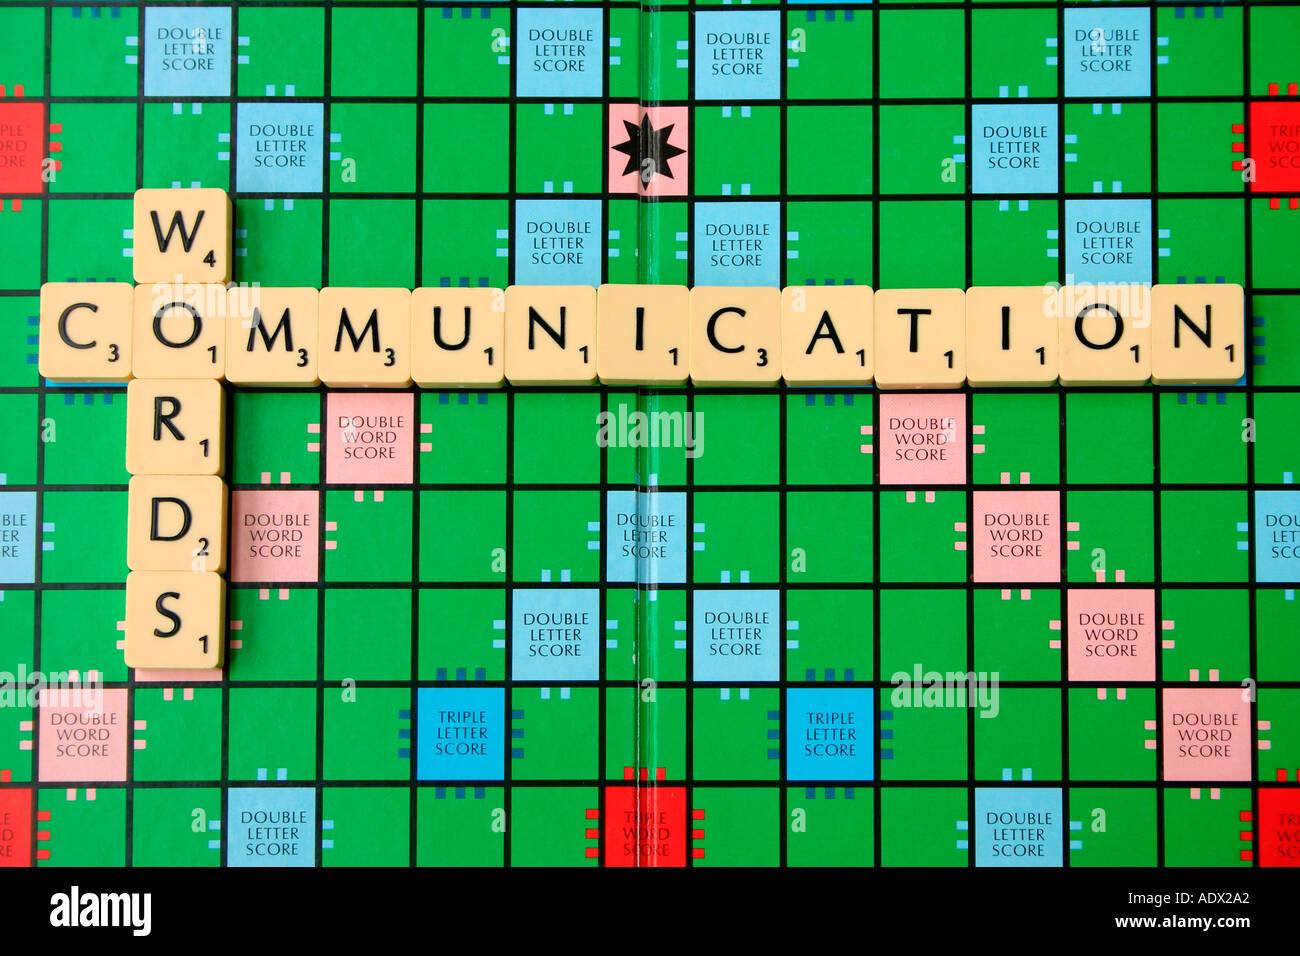 word board game stock photo 2515617 alamy